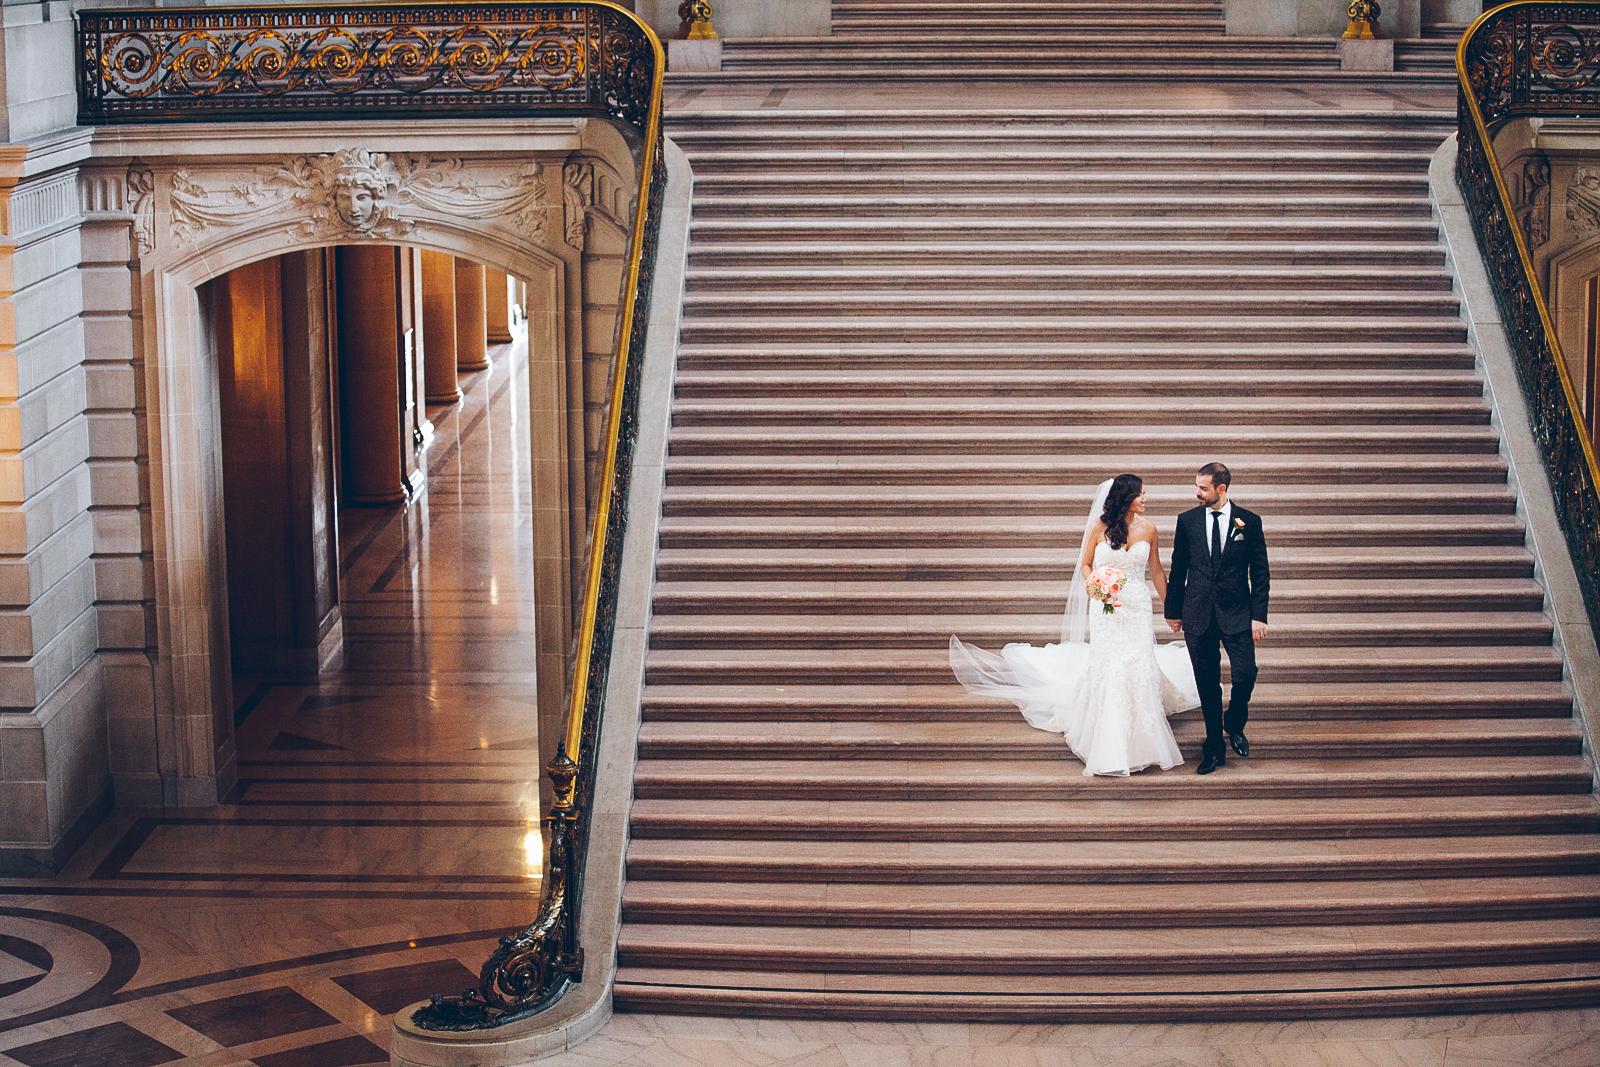 San_francisco_city_hall_wedding_photography_meegan_travis_ebony_siovhan_bokeh_photography_52.jpg